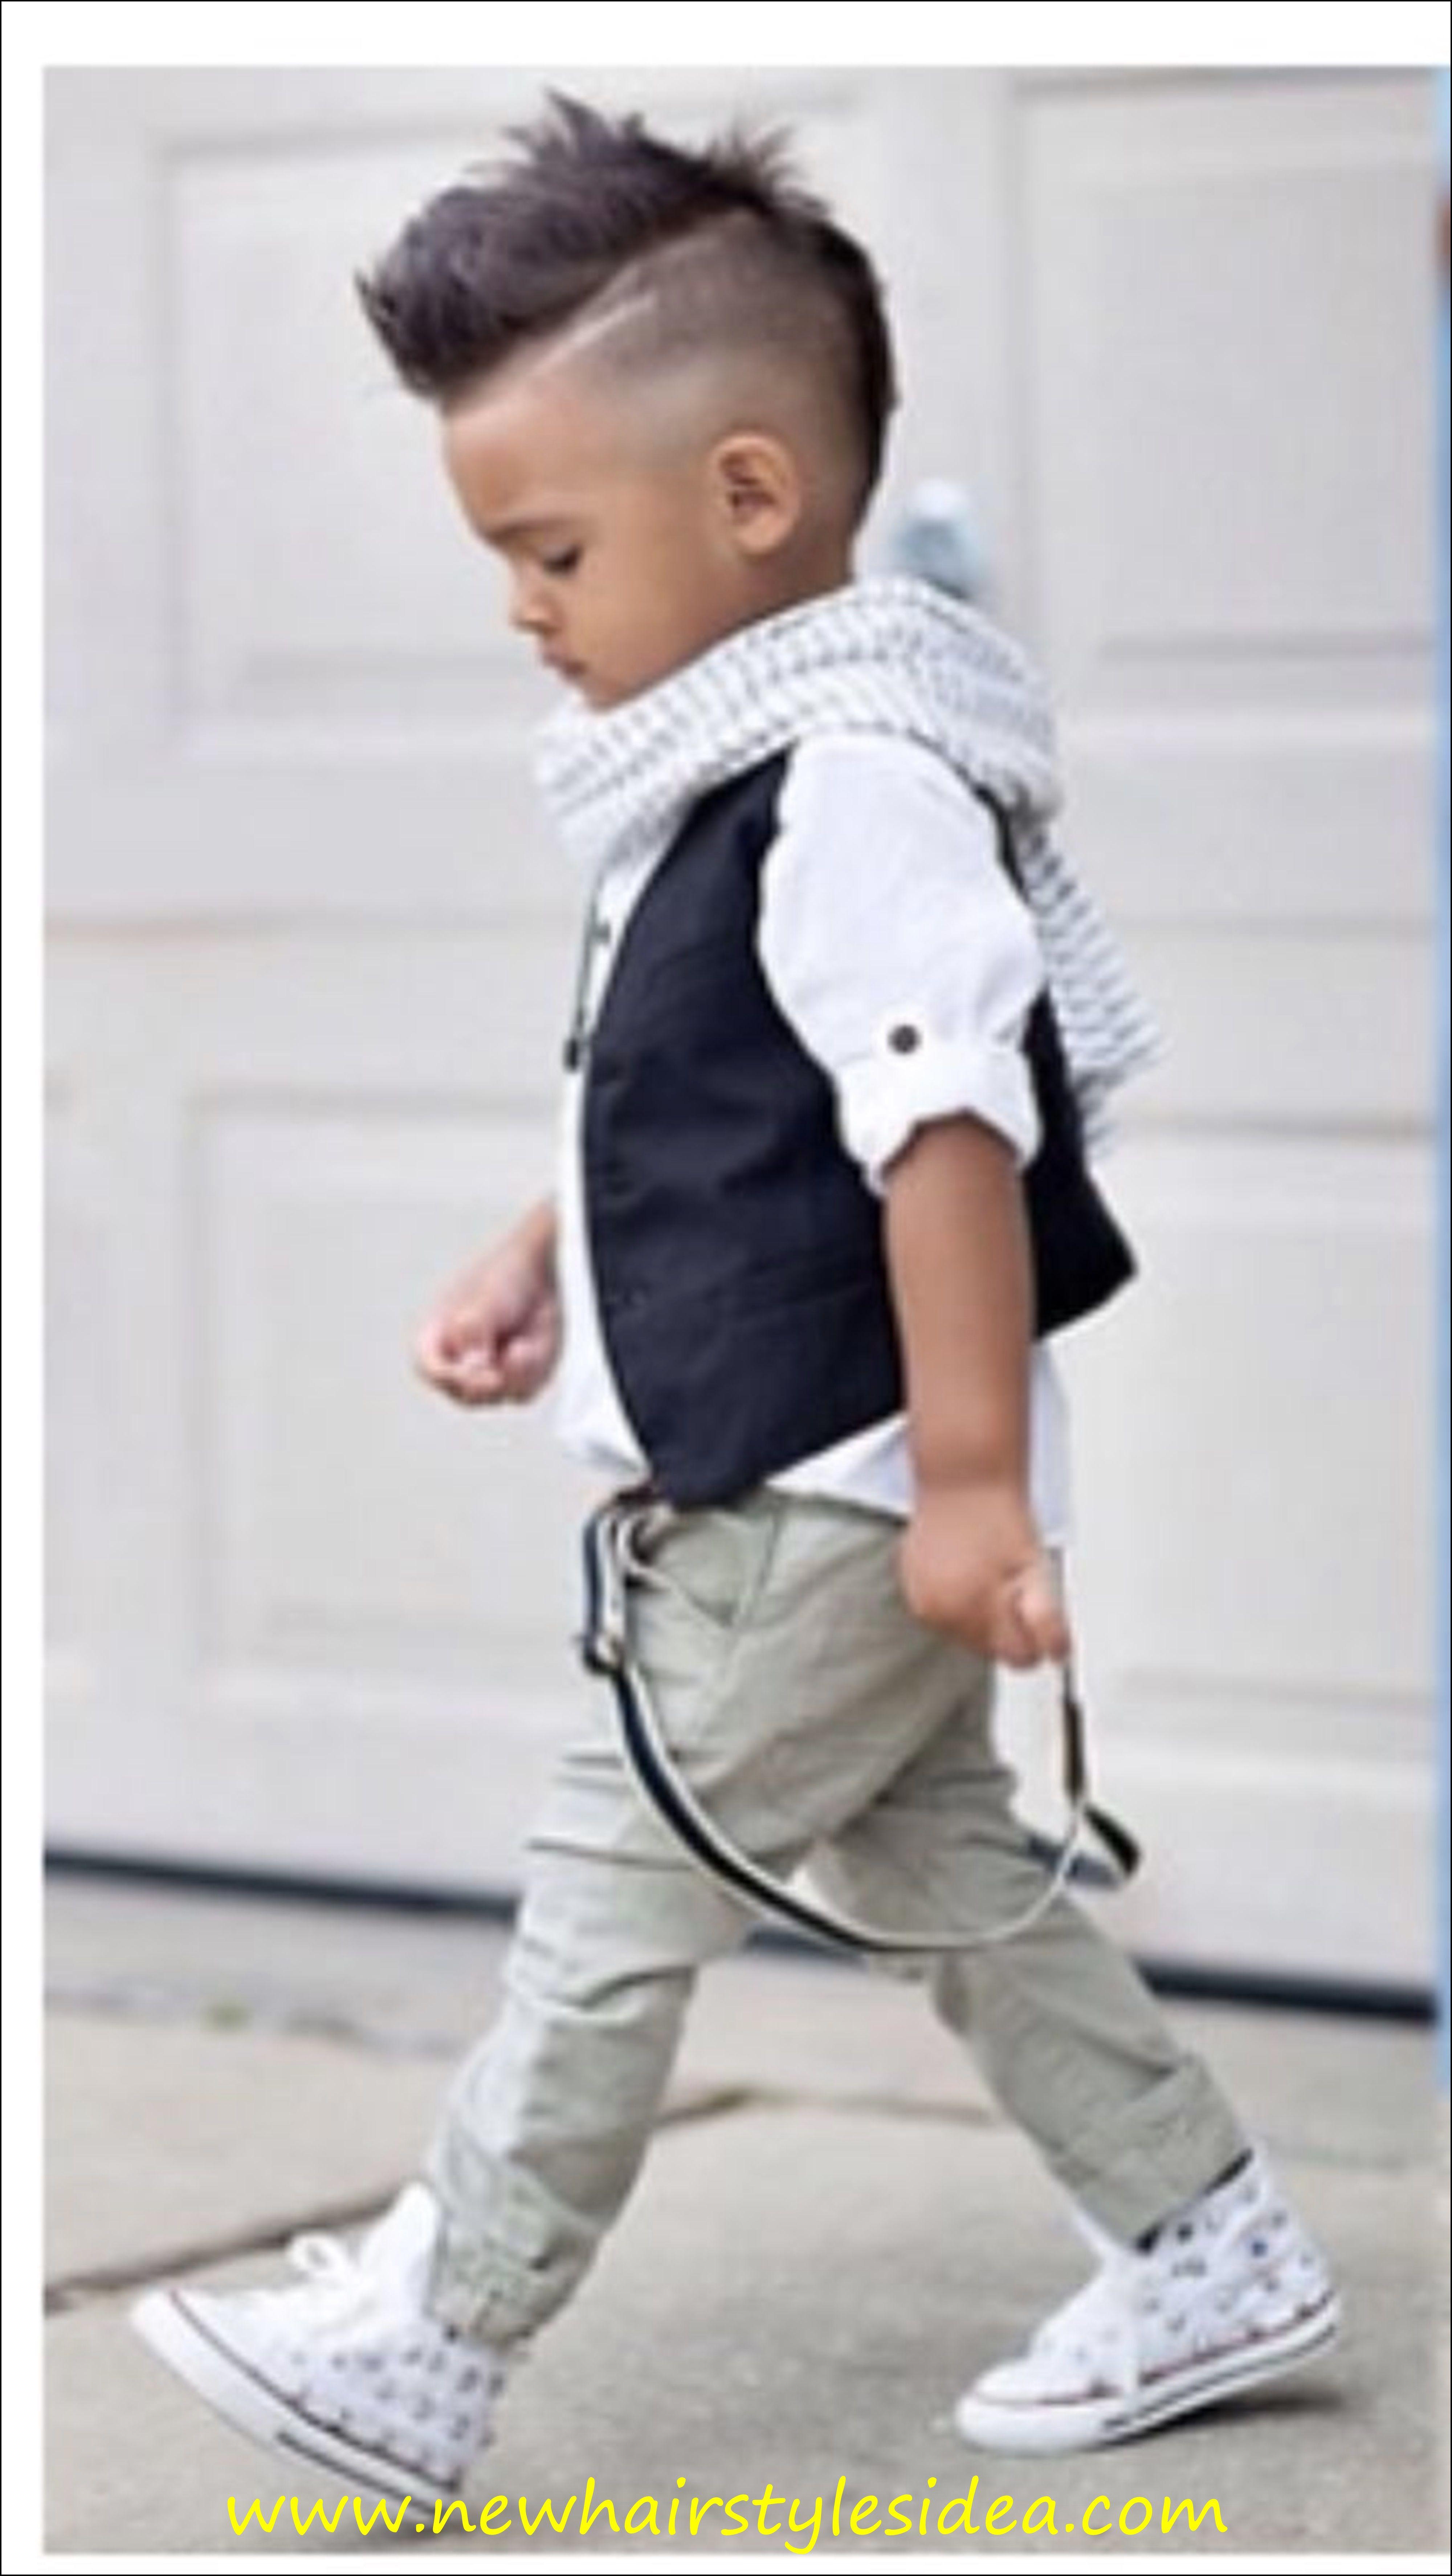 Black Boy Haircut 9 2015 New Hairstyles Idea 2015 New In Baby Boy